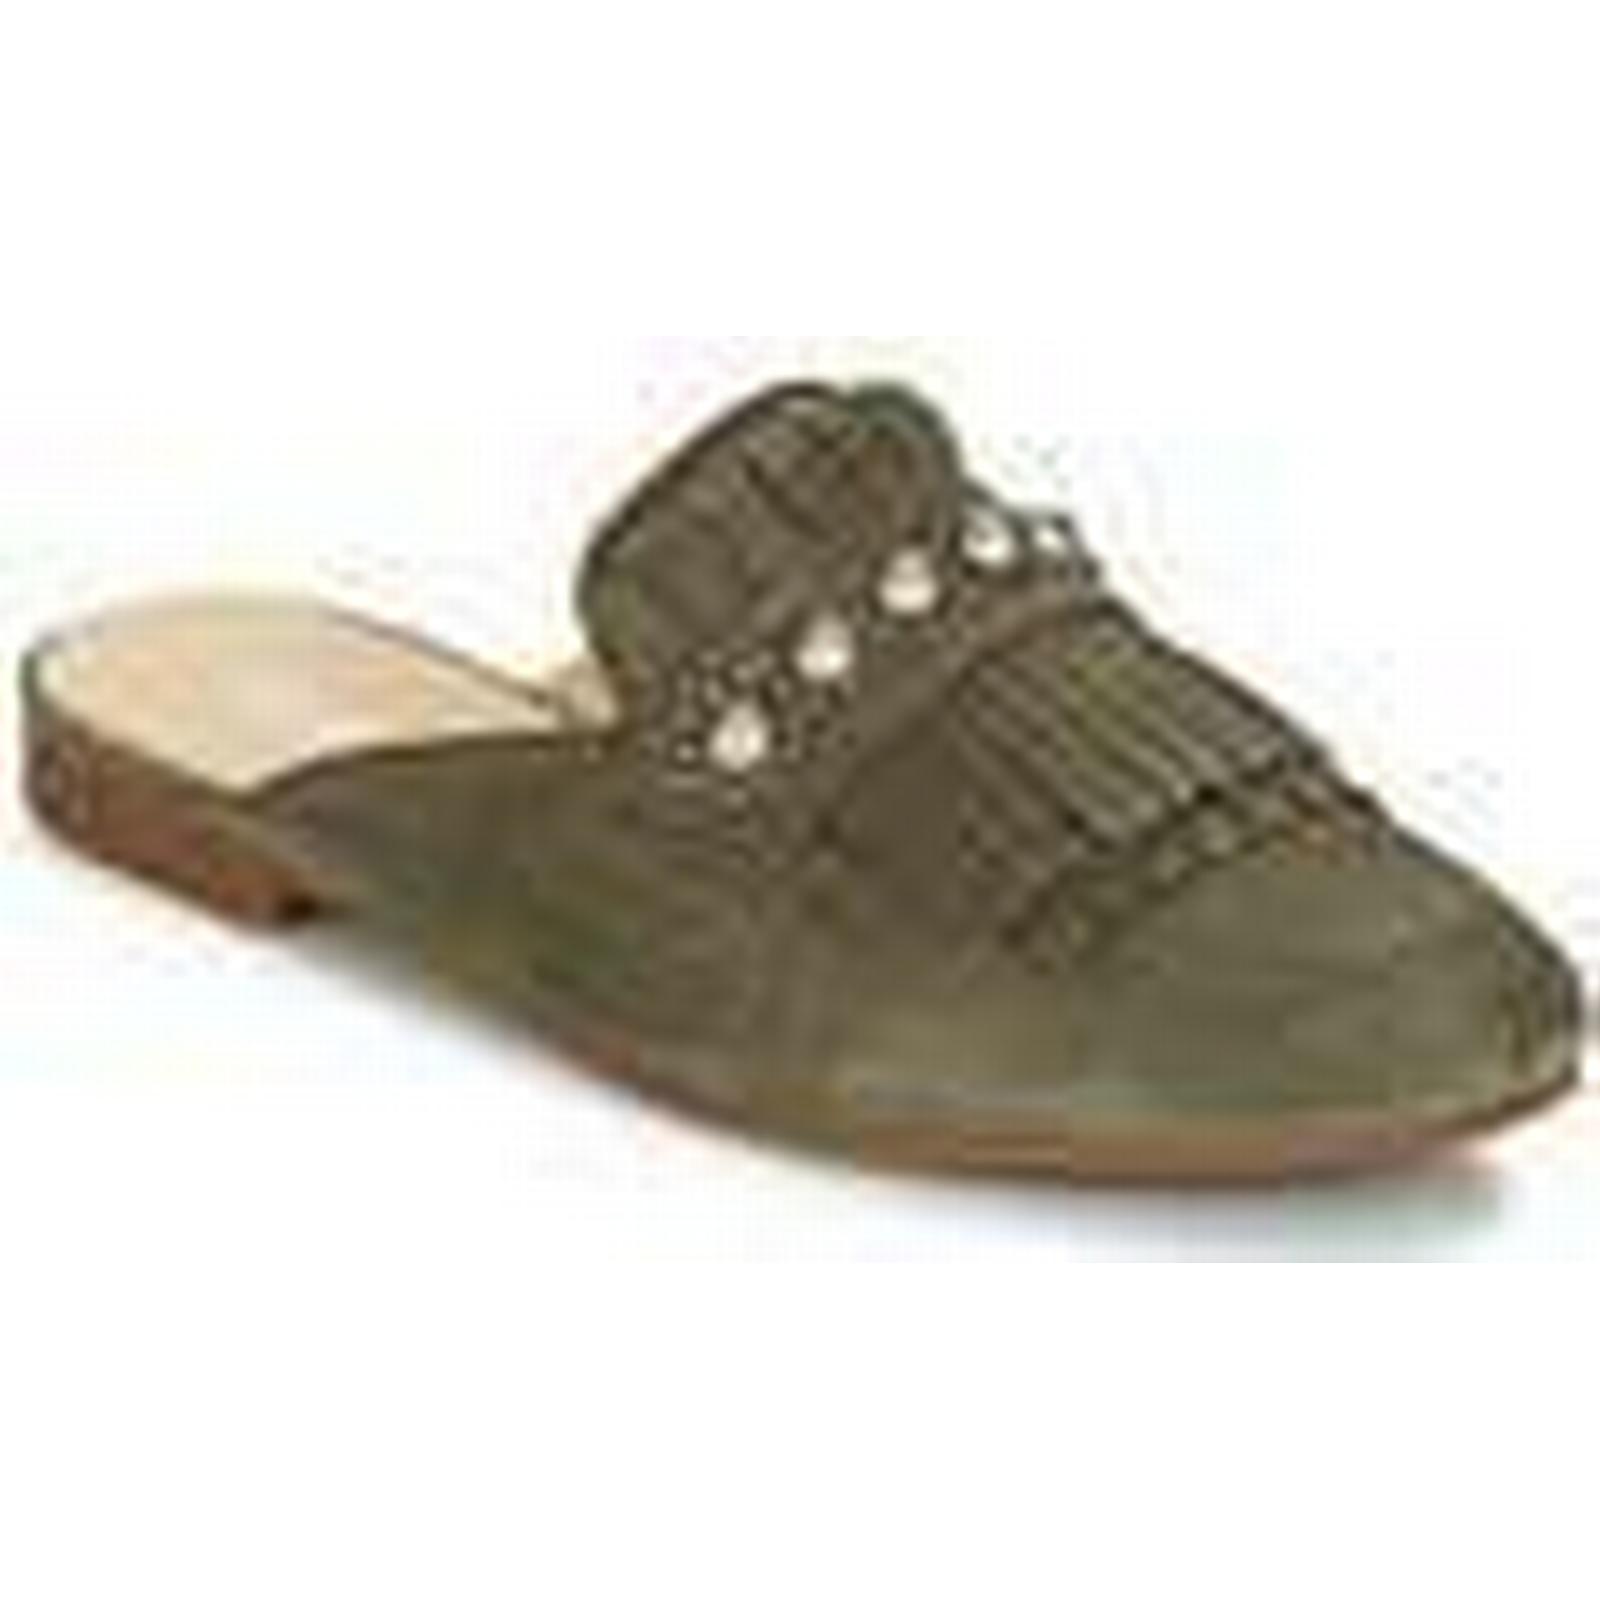 605e4ae8a Gabor NEMADA women  x27 s Mules   Casual Shoes in Green 7aade4 ...